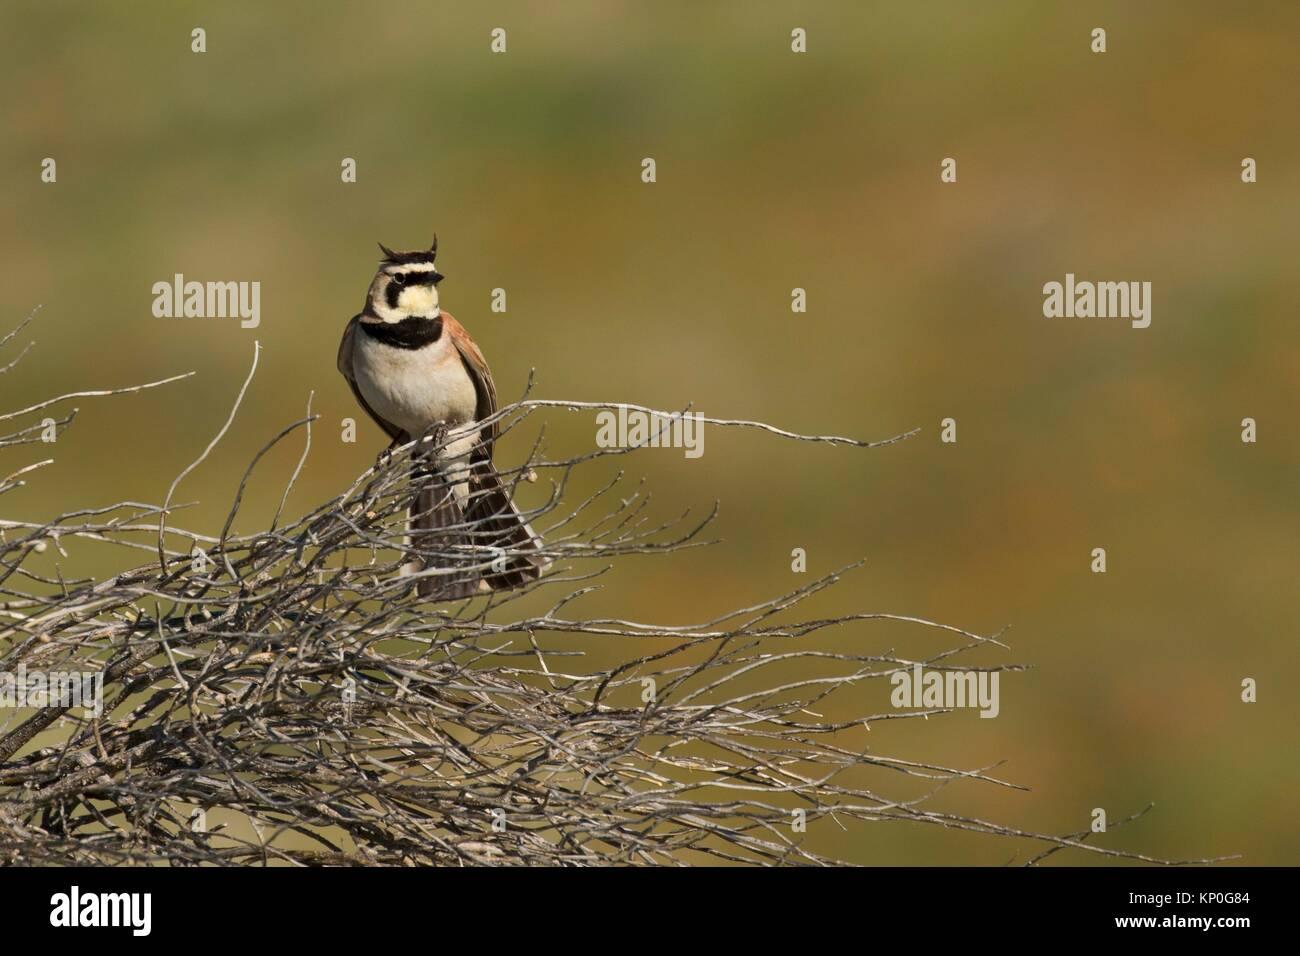 Alouette, Antelope Valley California Poppy State Reserve, en Californie. Photo Stock